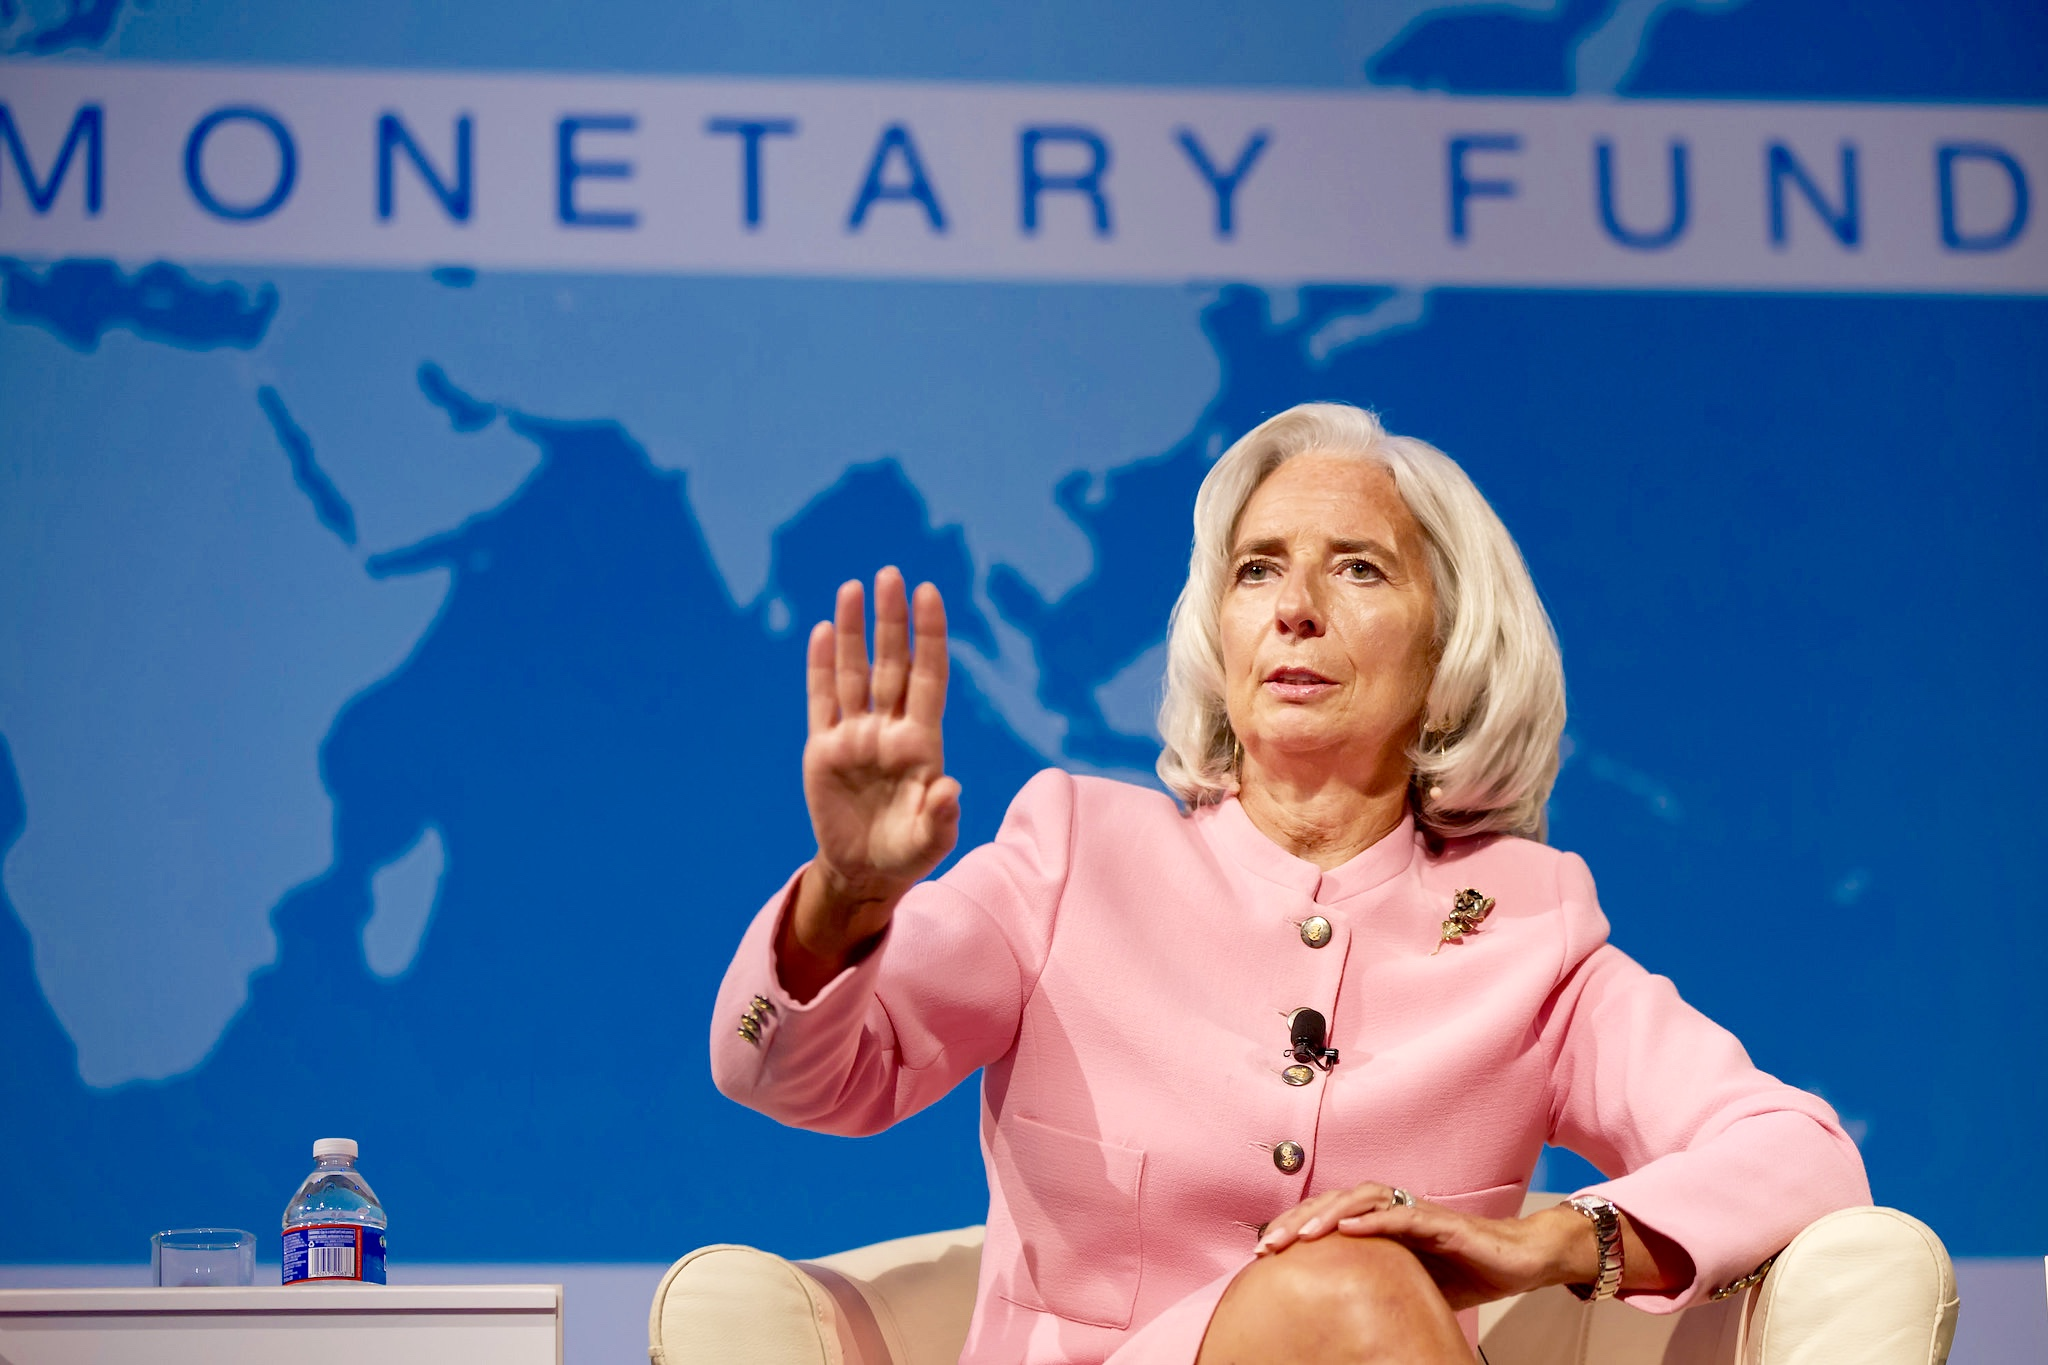 International Monetary Fund CC BY-NC-ND 2.0